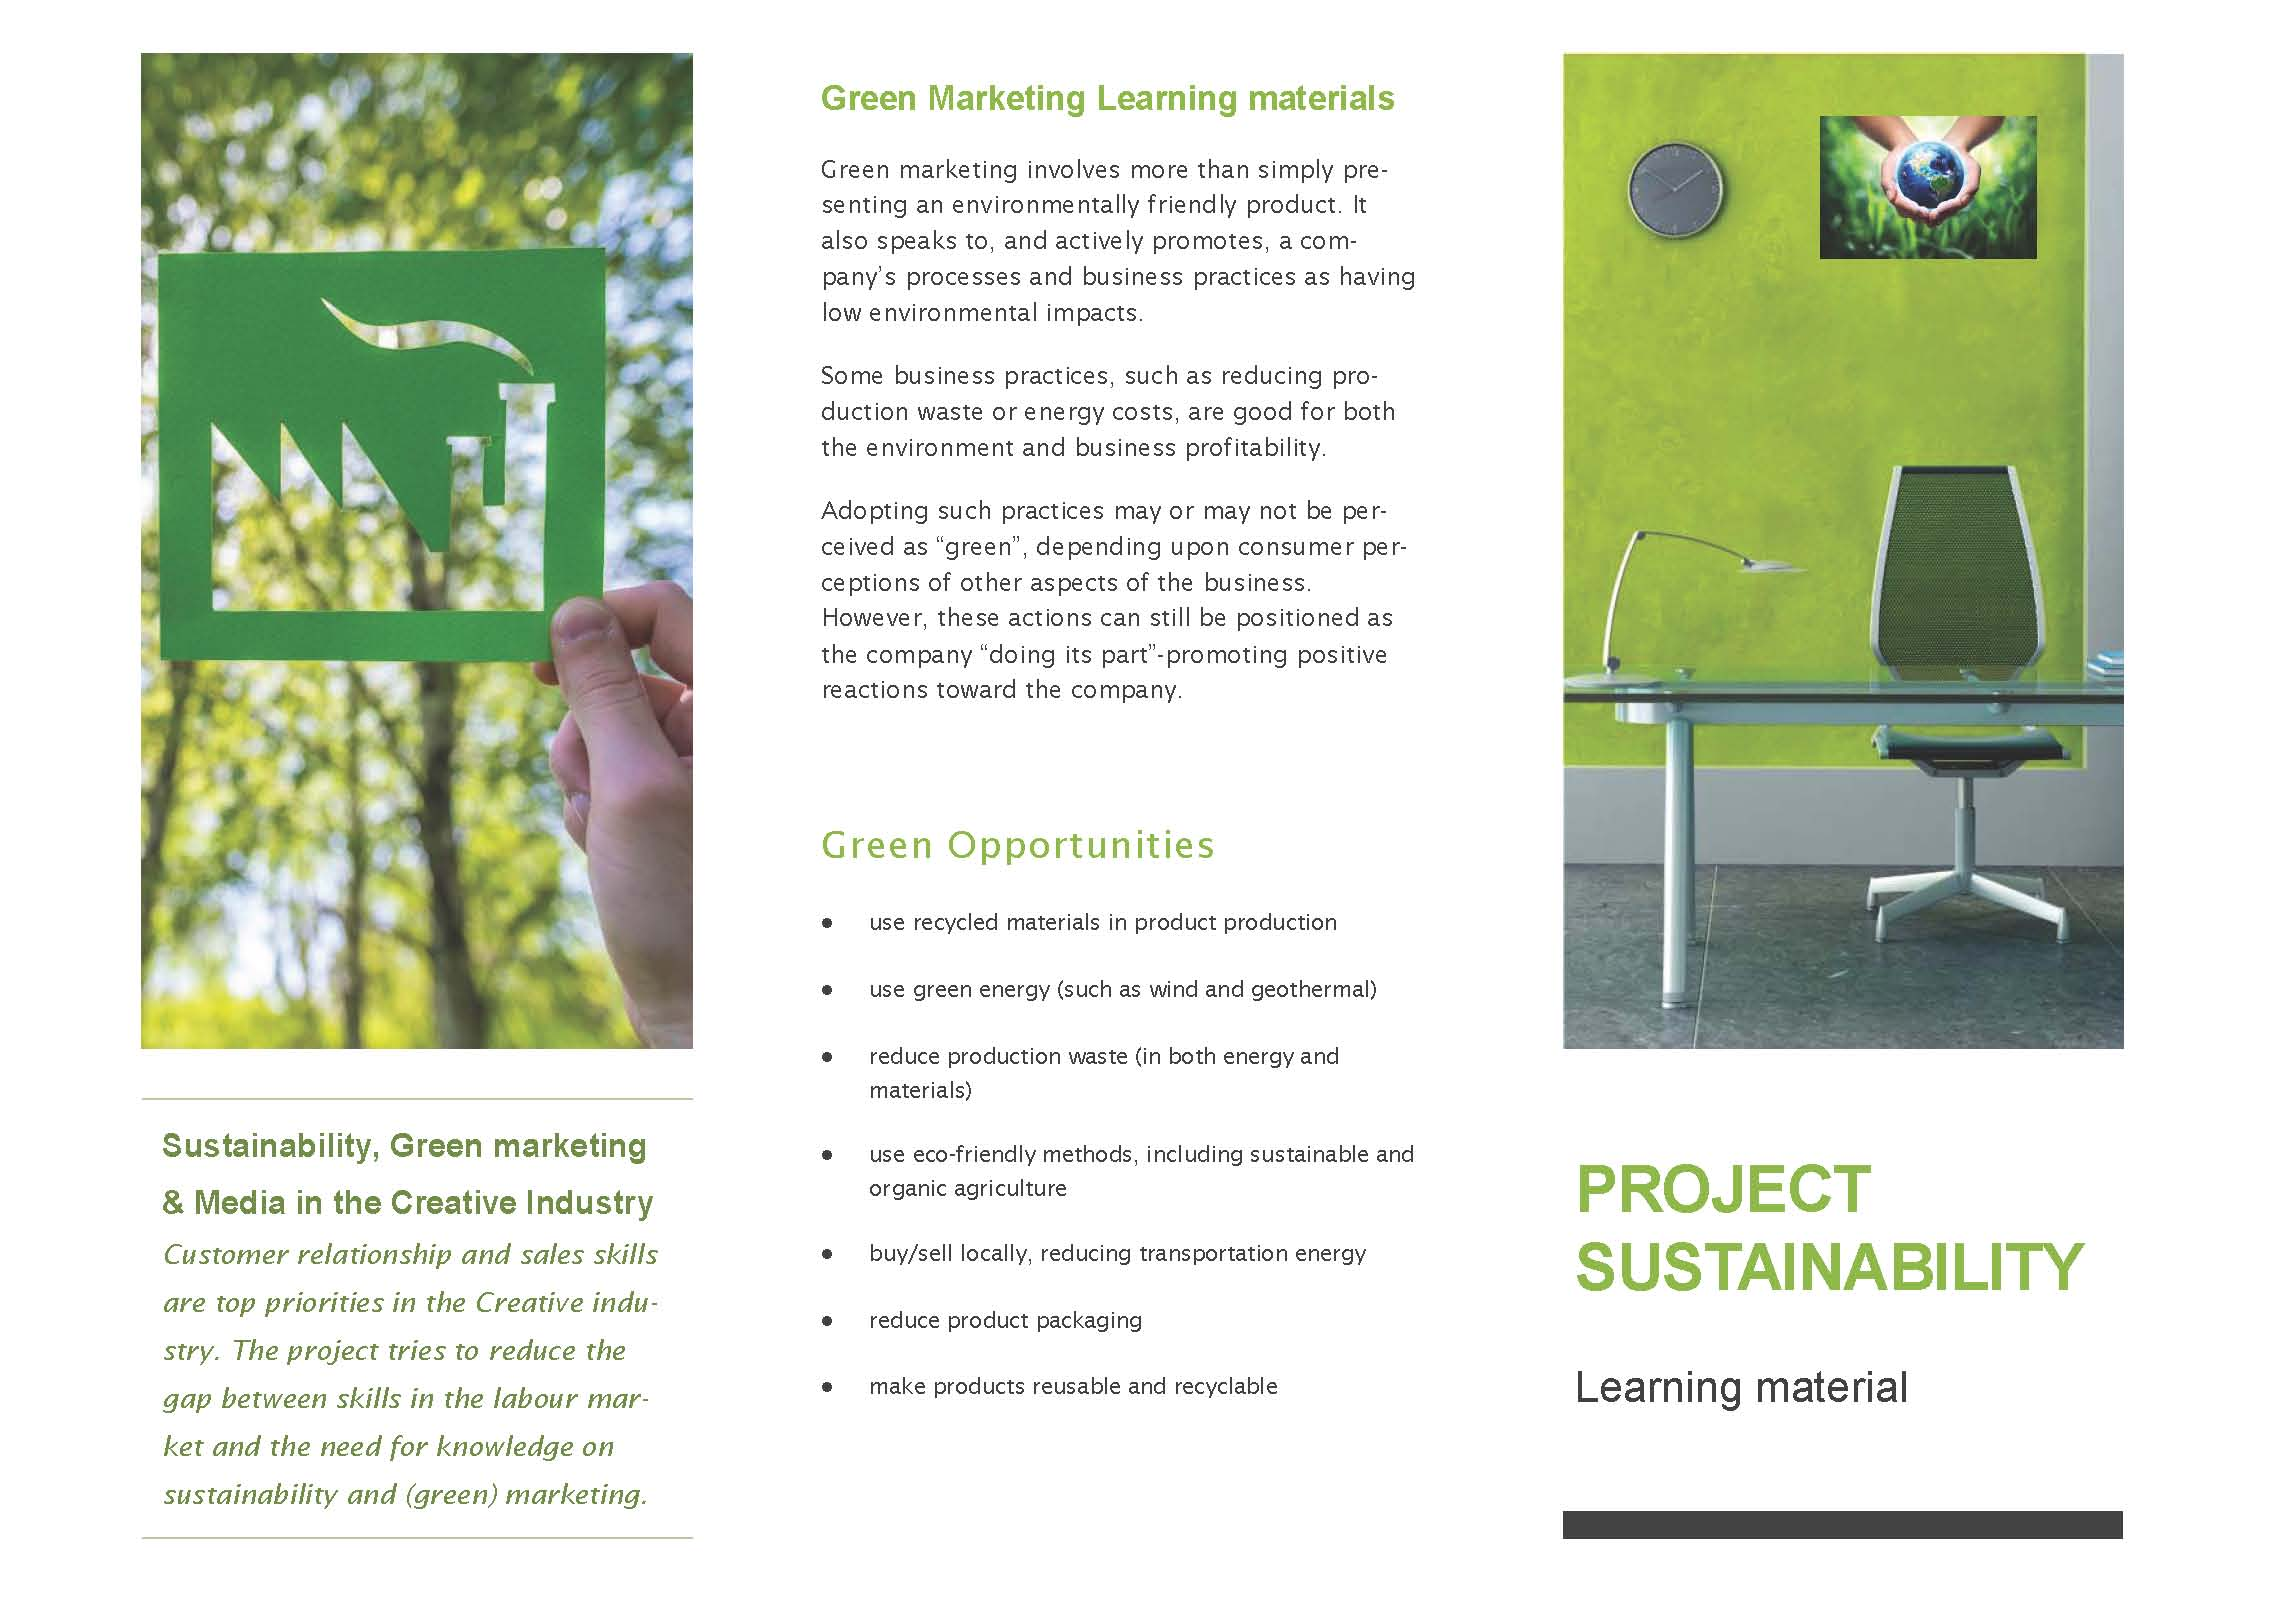 consumer attitude toward green marketing